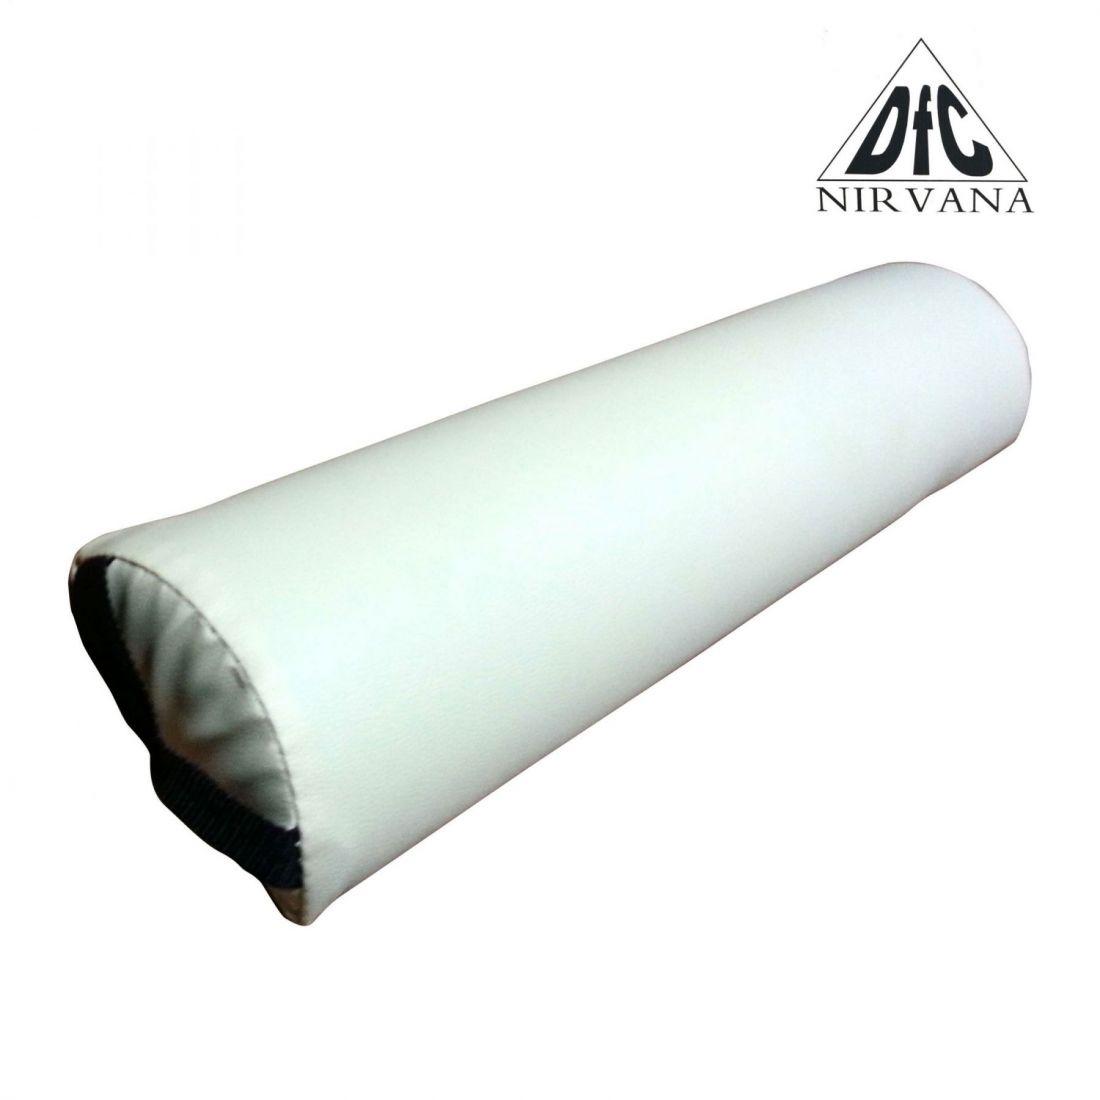 Валик для массажного стола DFC (7,5 х 65 см)